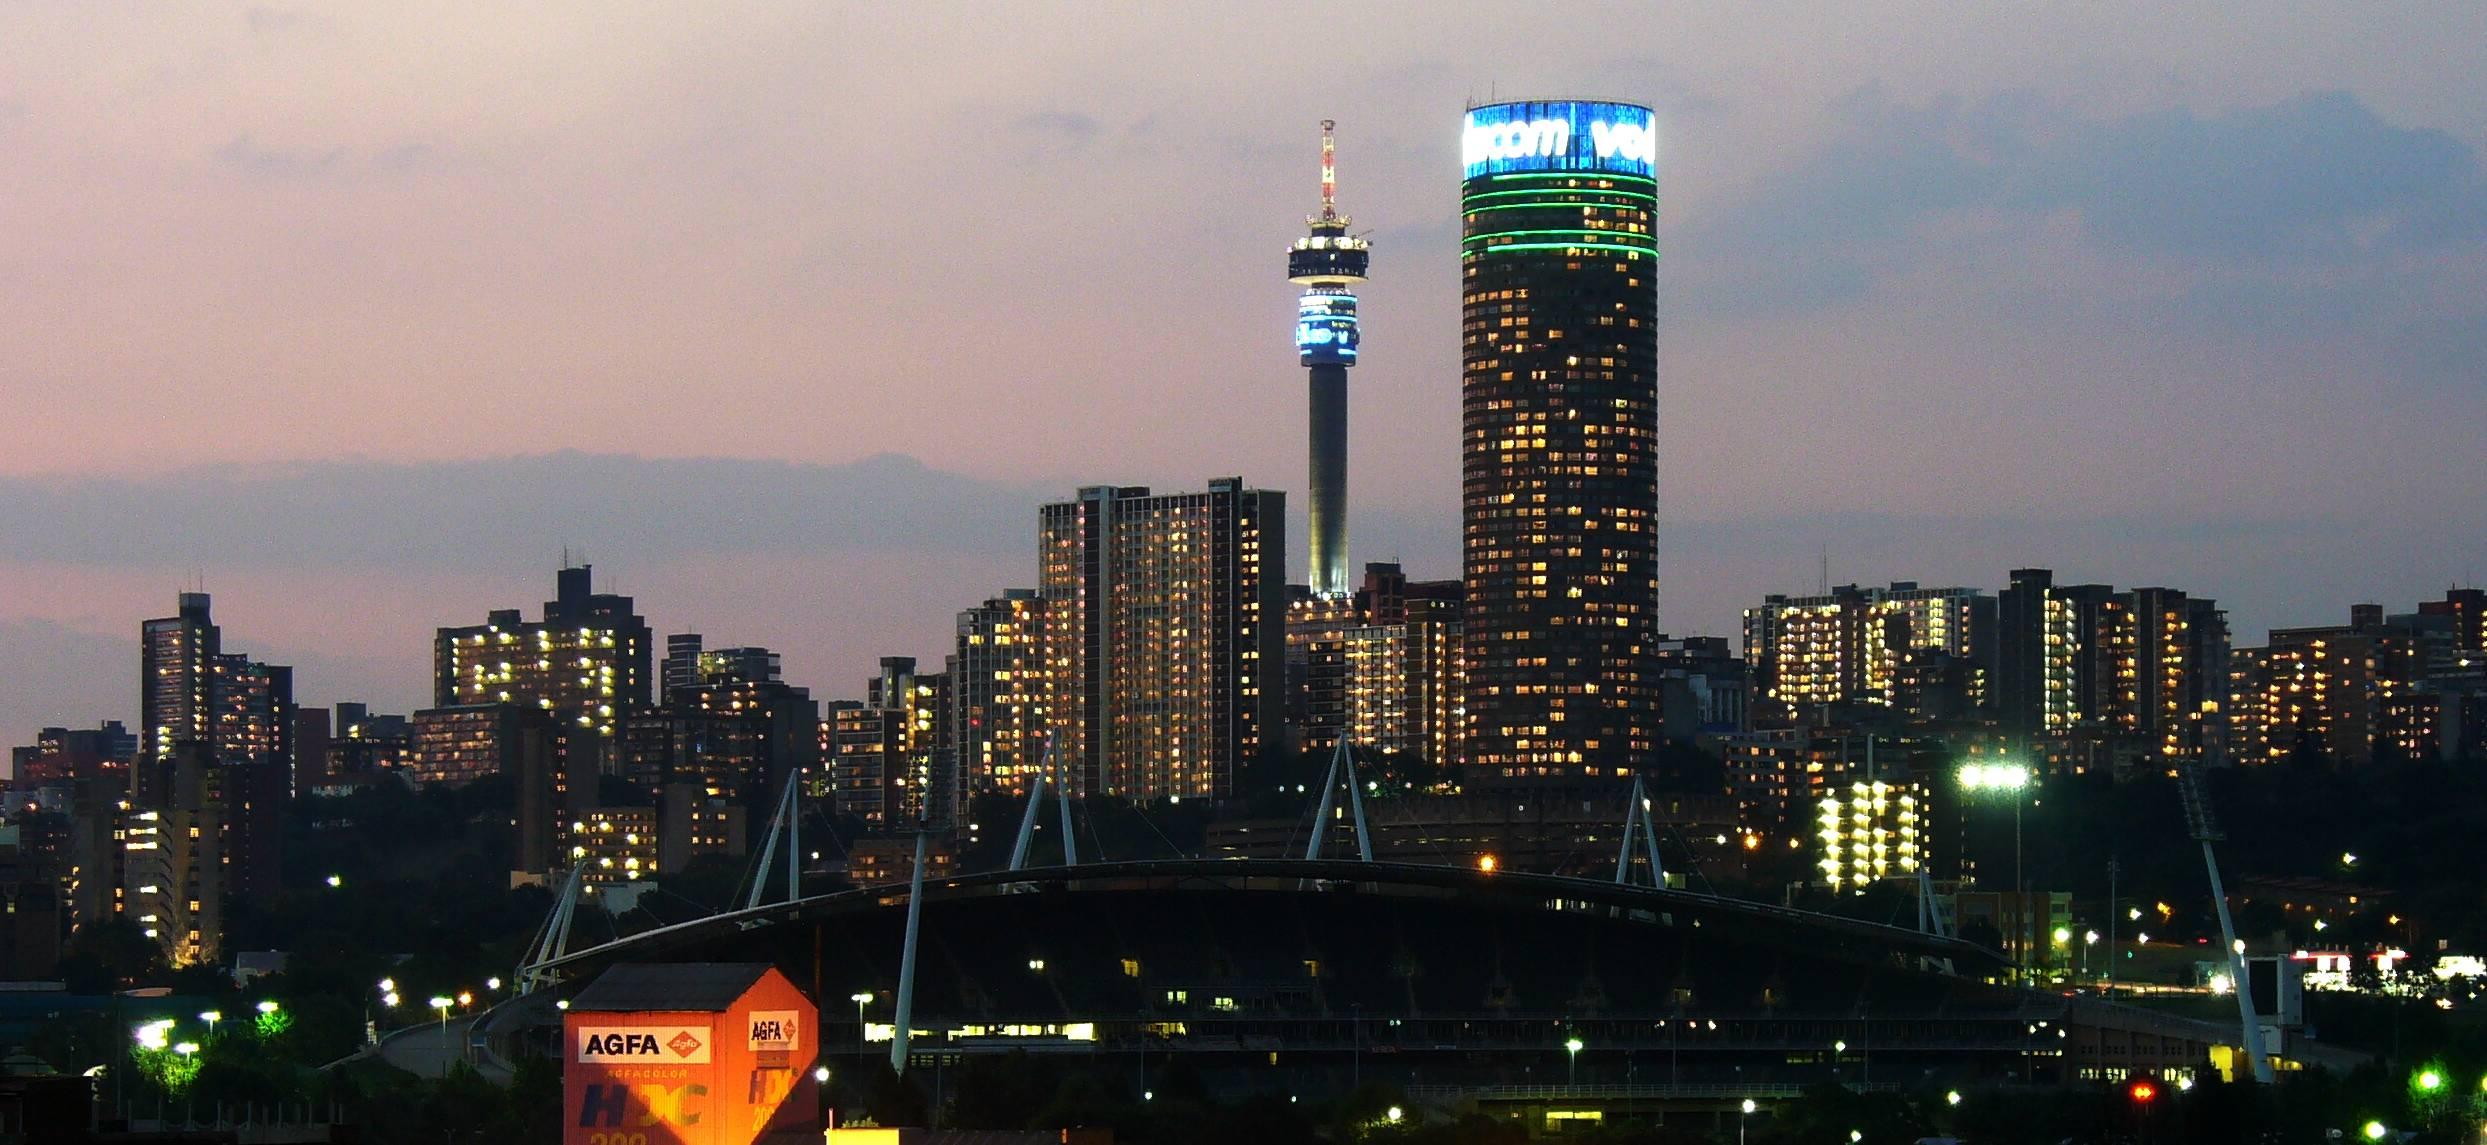 Is Johannesburg safe for tourists